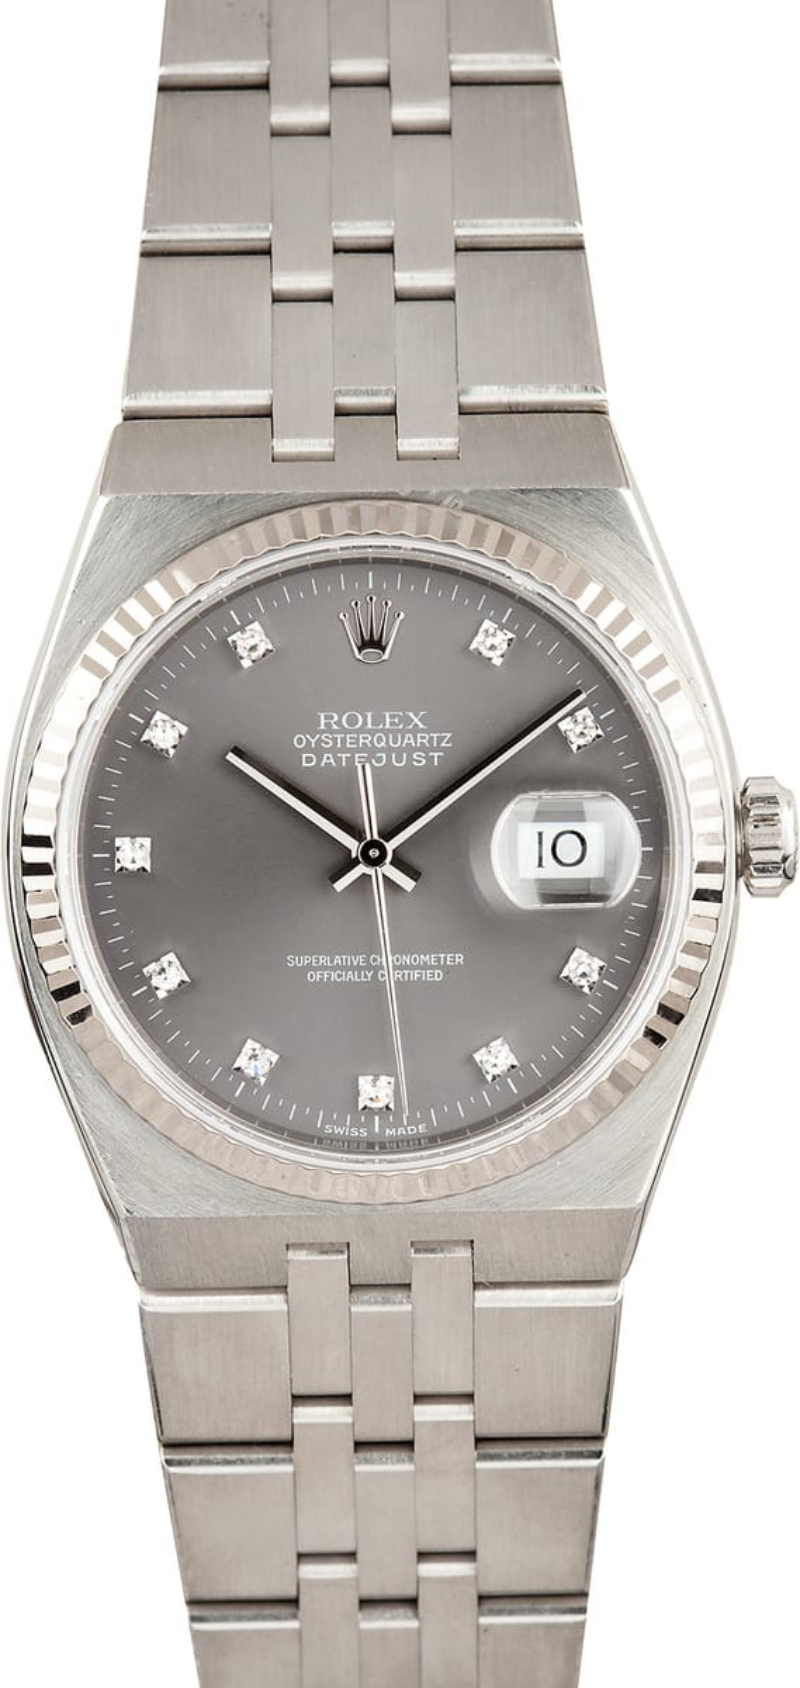 Used Rolex Daytona >> Rolex Datejust Oysterquartz Diamond Dial 17014 Save up to 50%